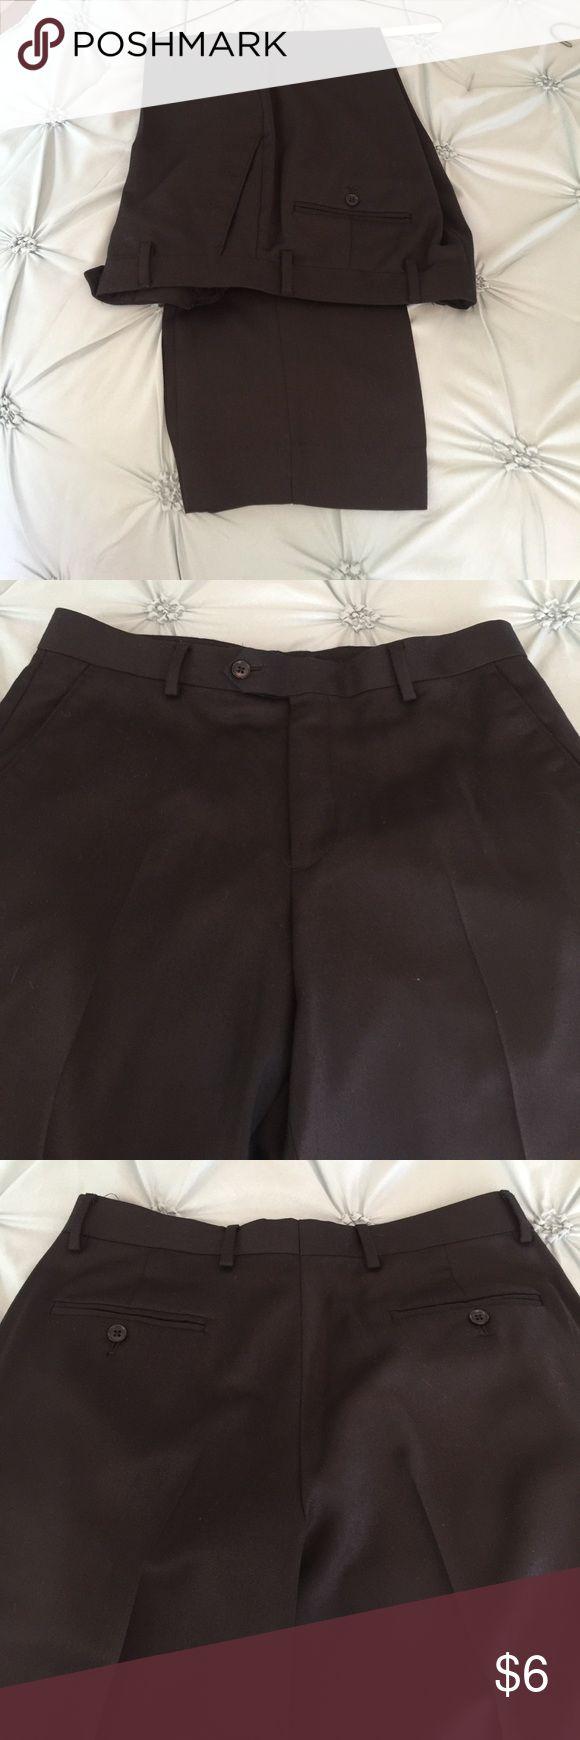 Men's Slacks U. S. Polo Association Brand. 34 W 30 L.  Good used condition. Wool Polyester blend. U. S. Polo Association Pants